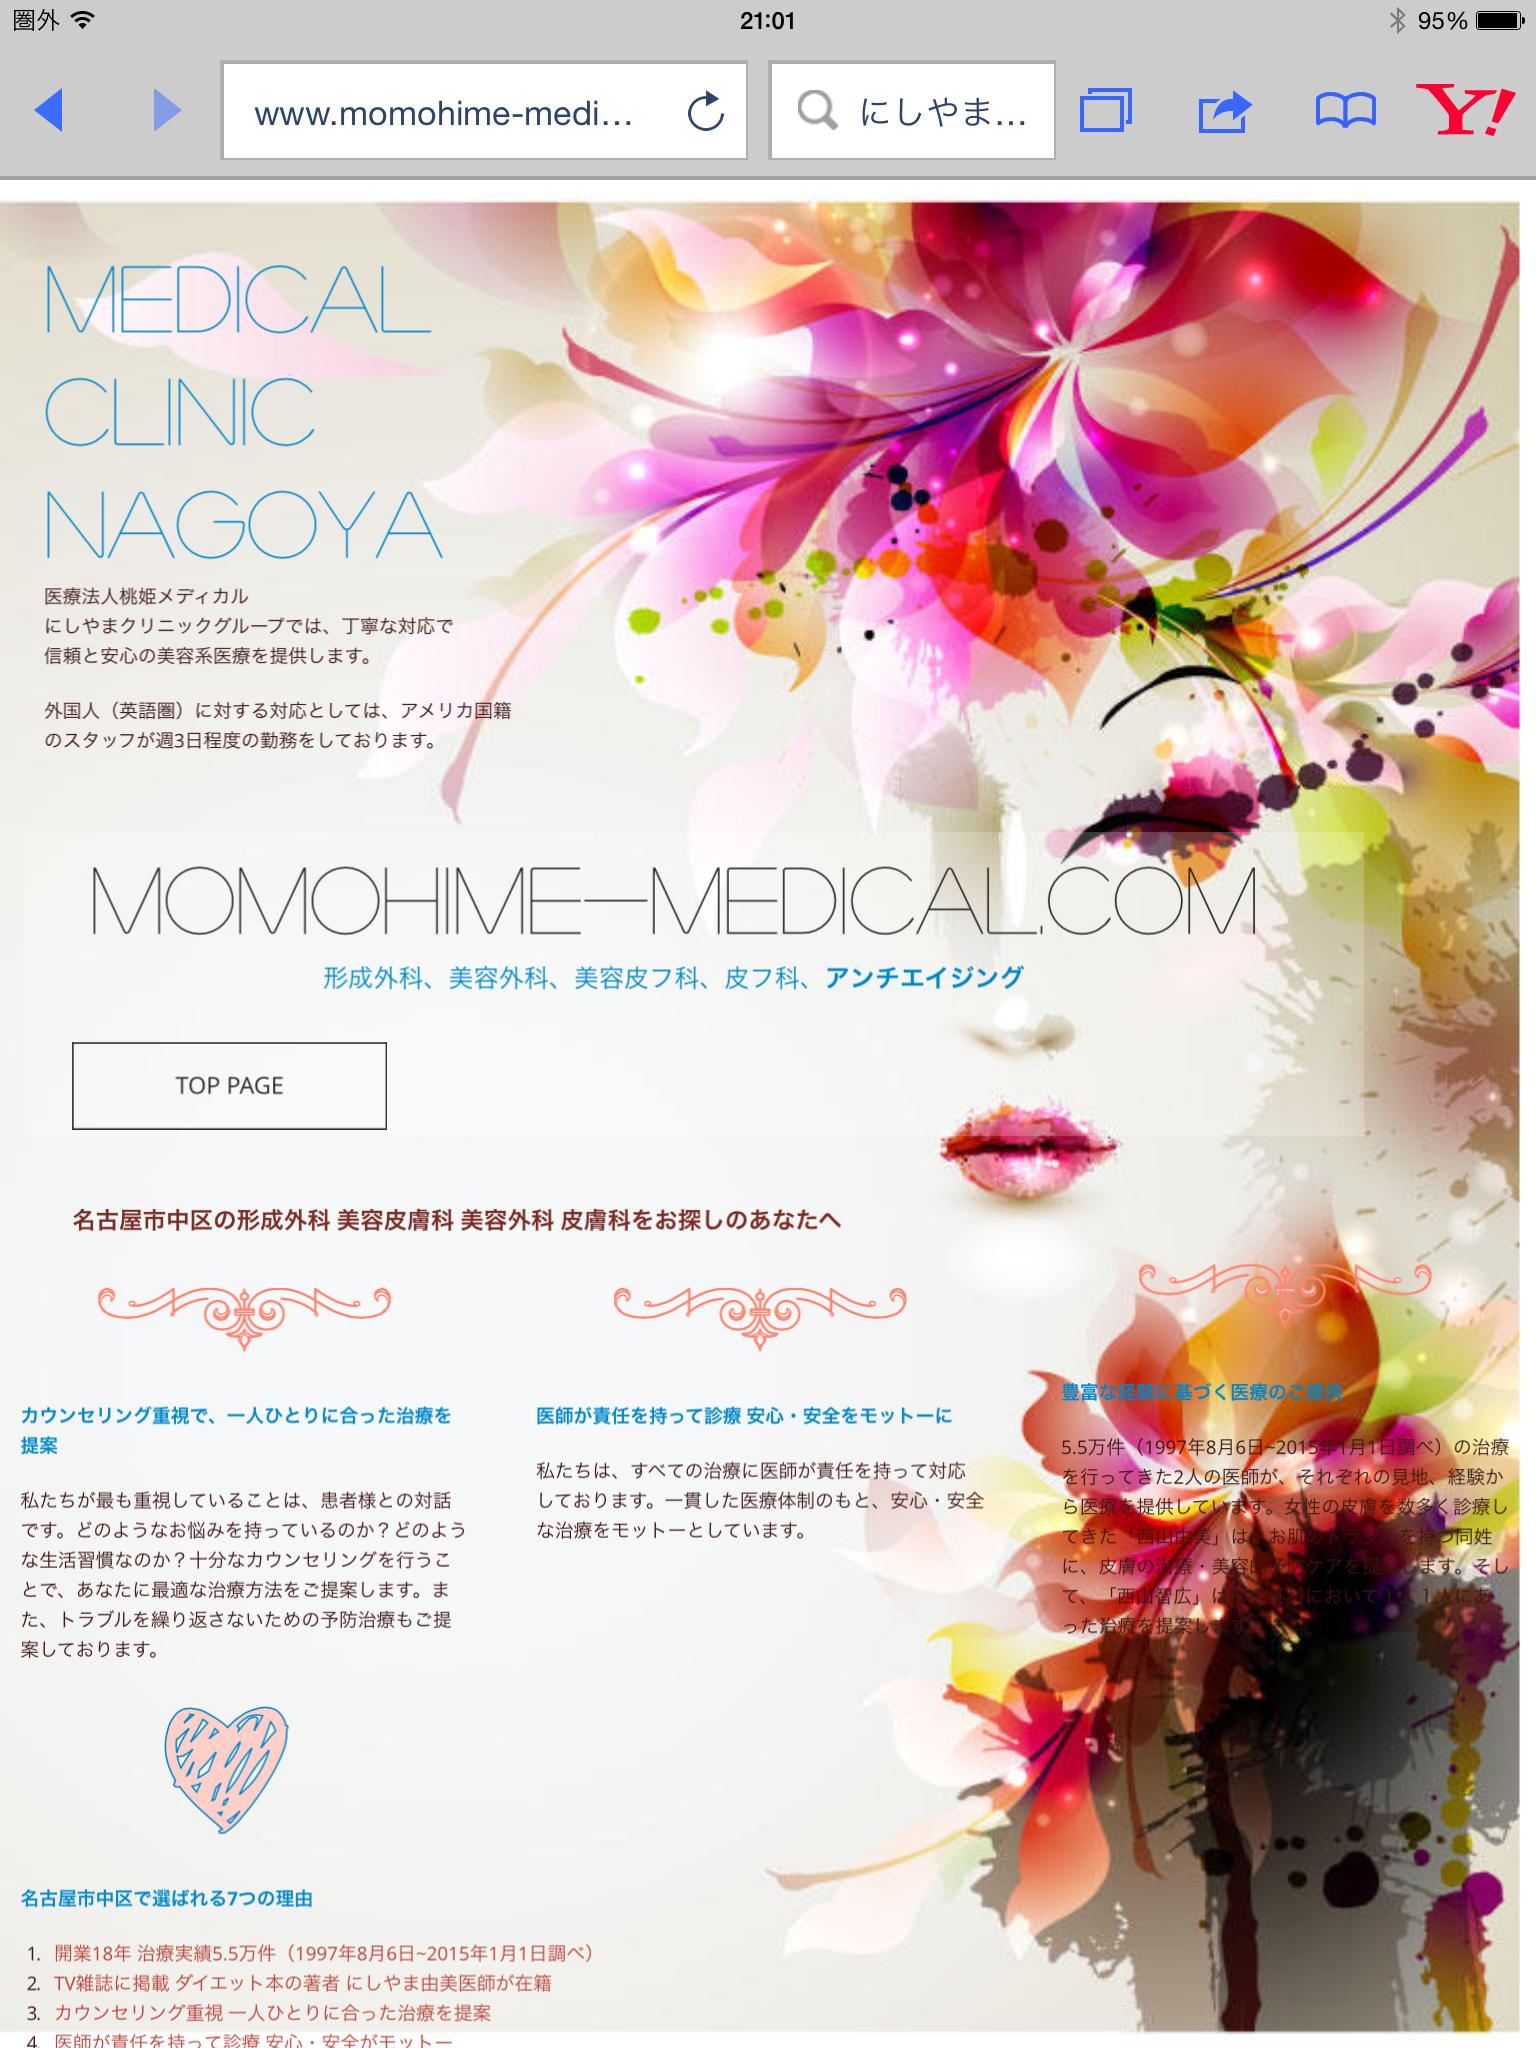 momohime-medical.com